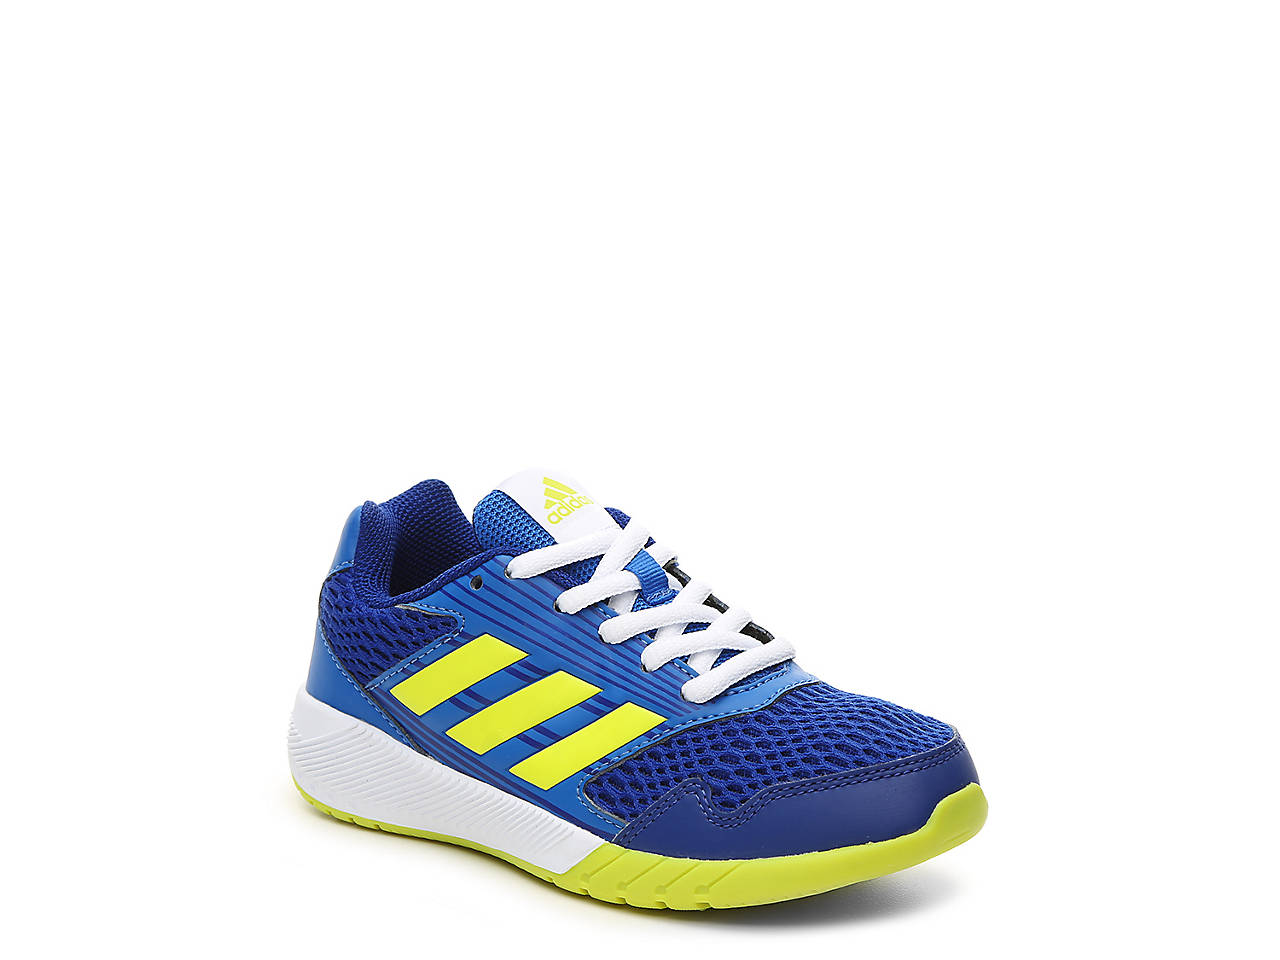 adidas altarun bambino & youth scarpa da corsa, ragazzi scarpe dsw